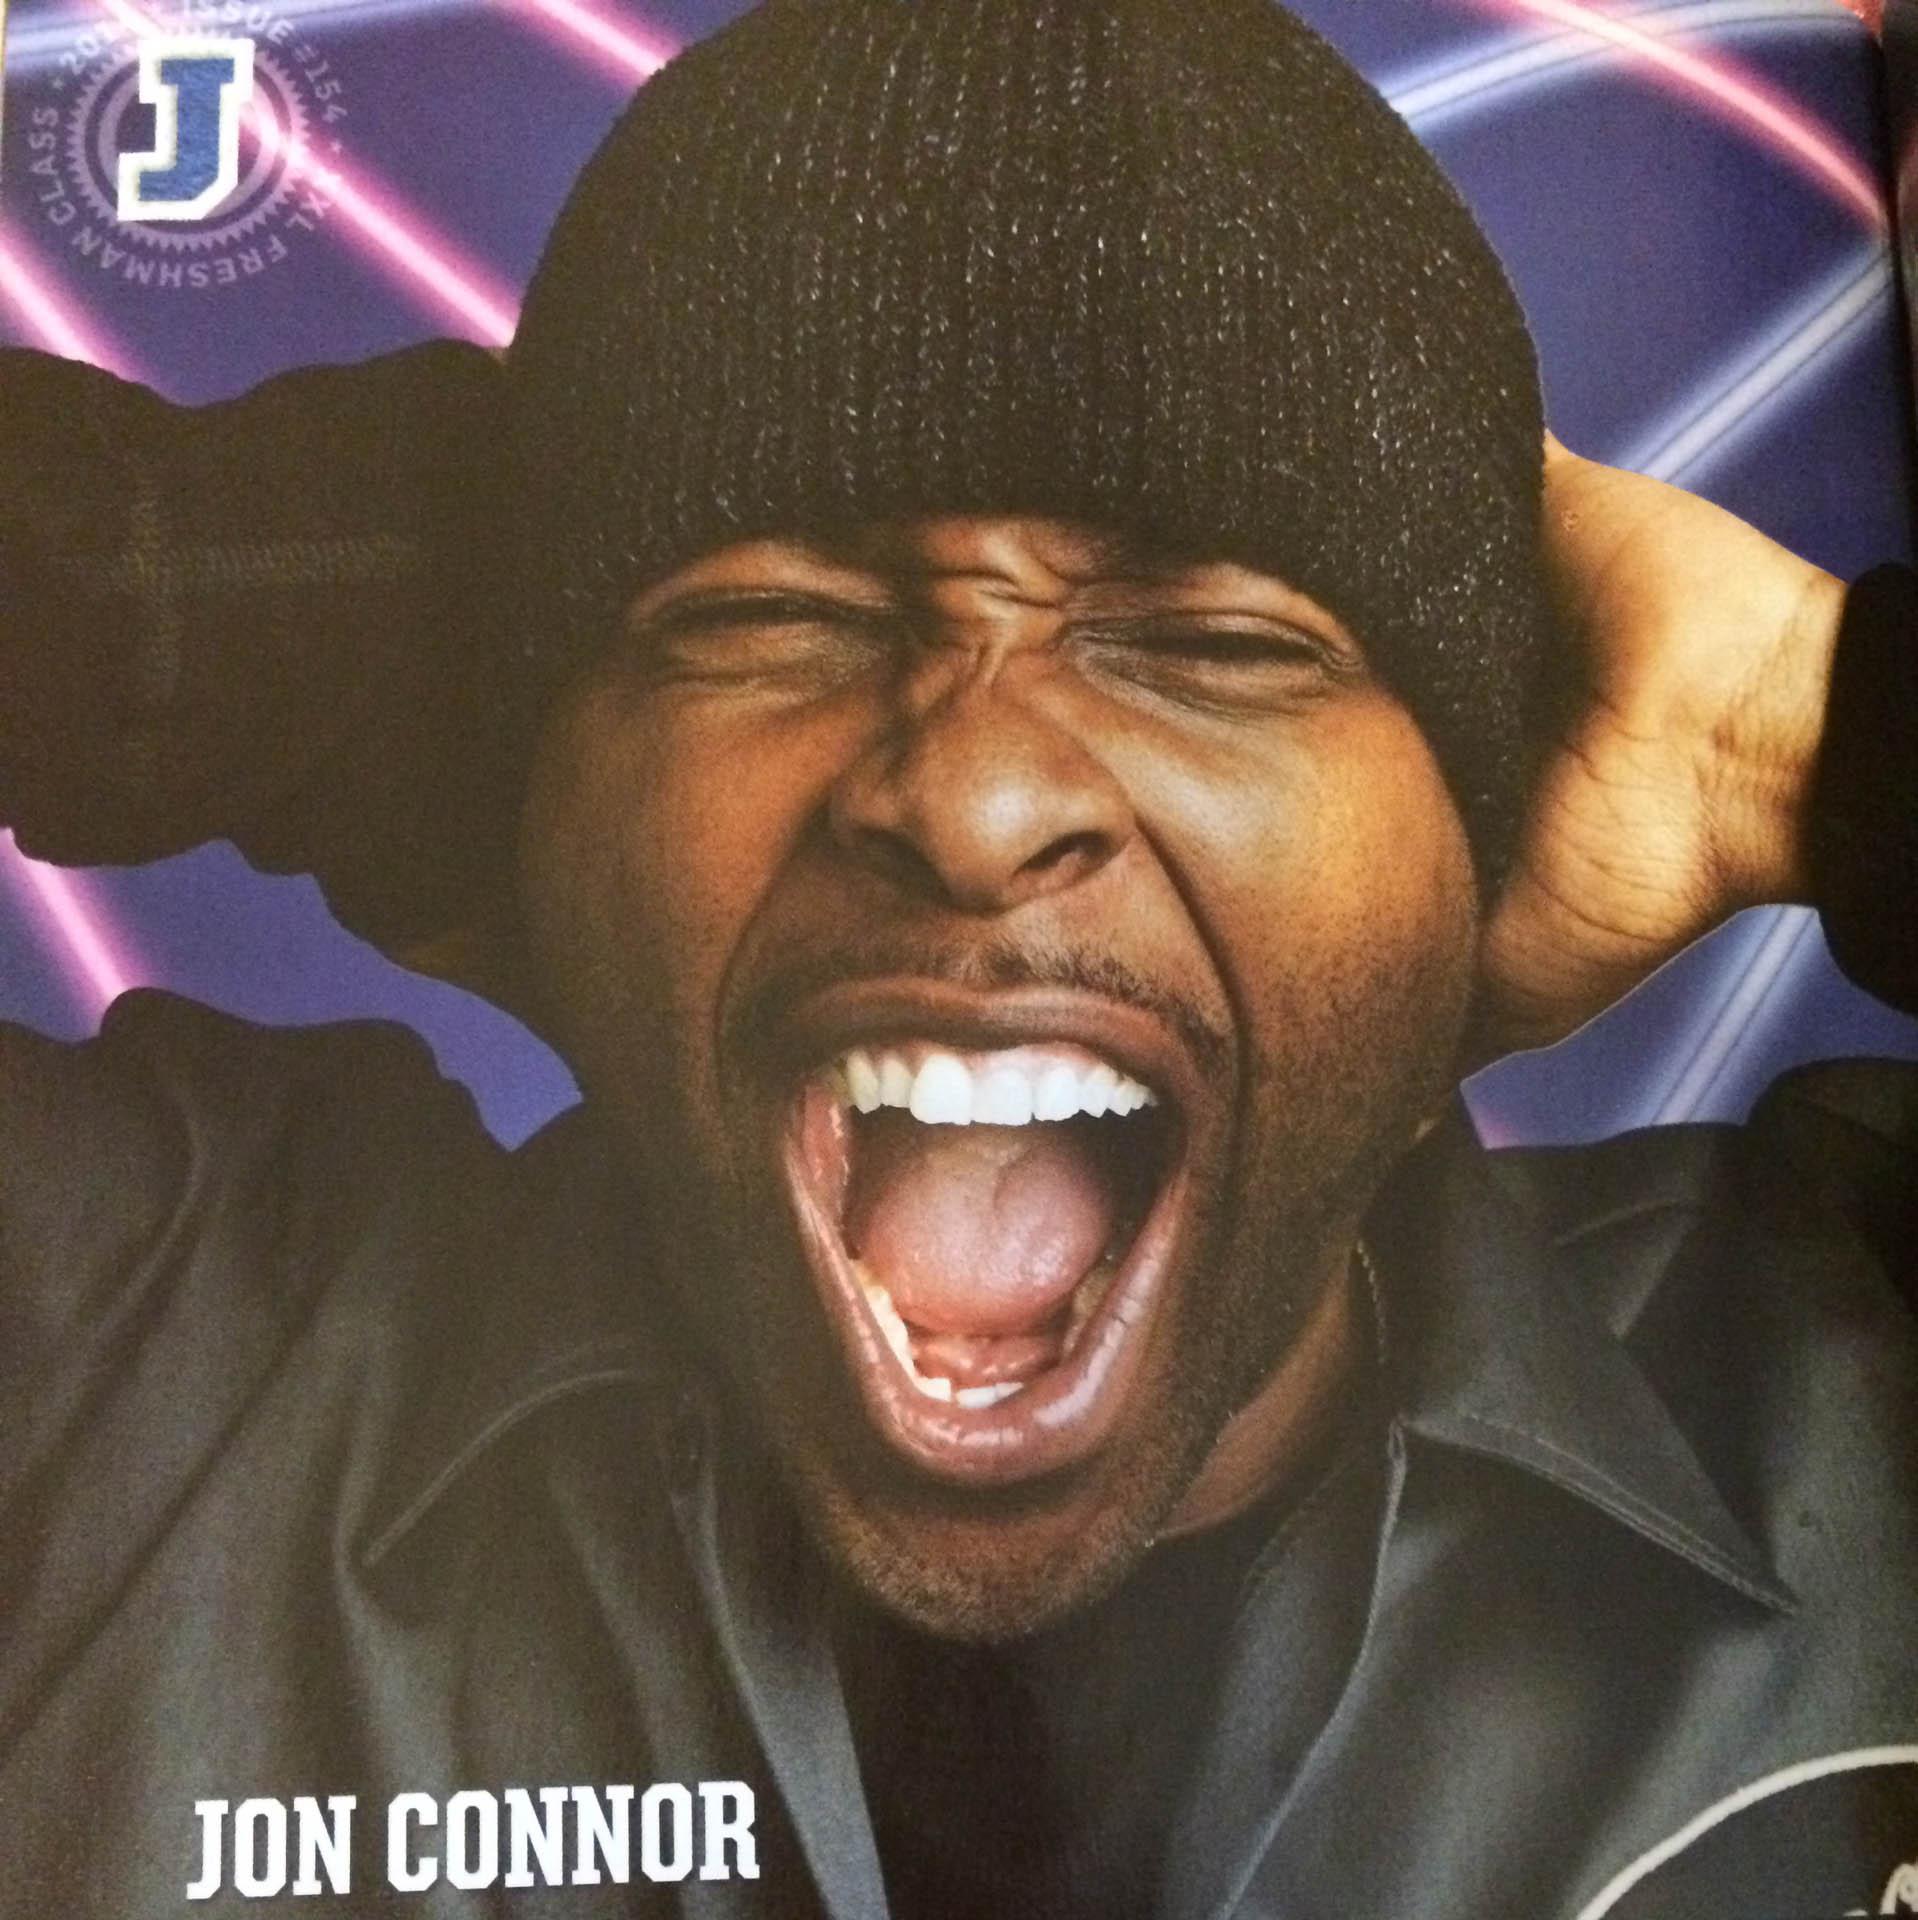 Jon Connor - новый протеже Dr. Dre